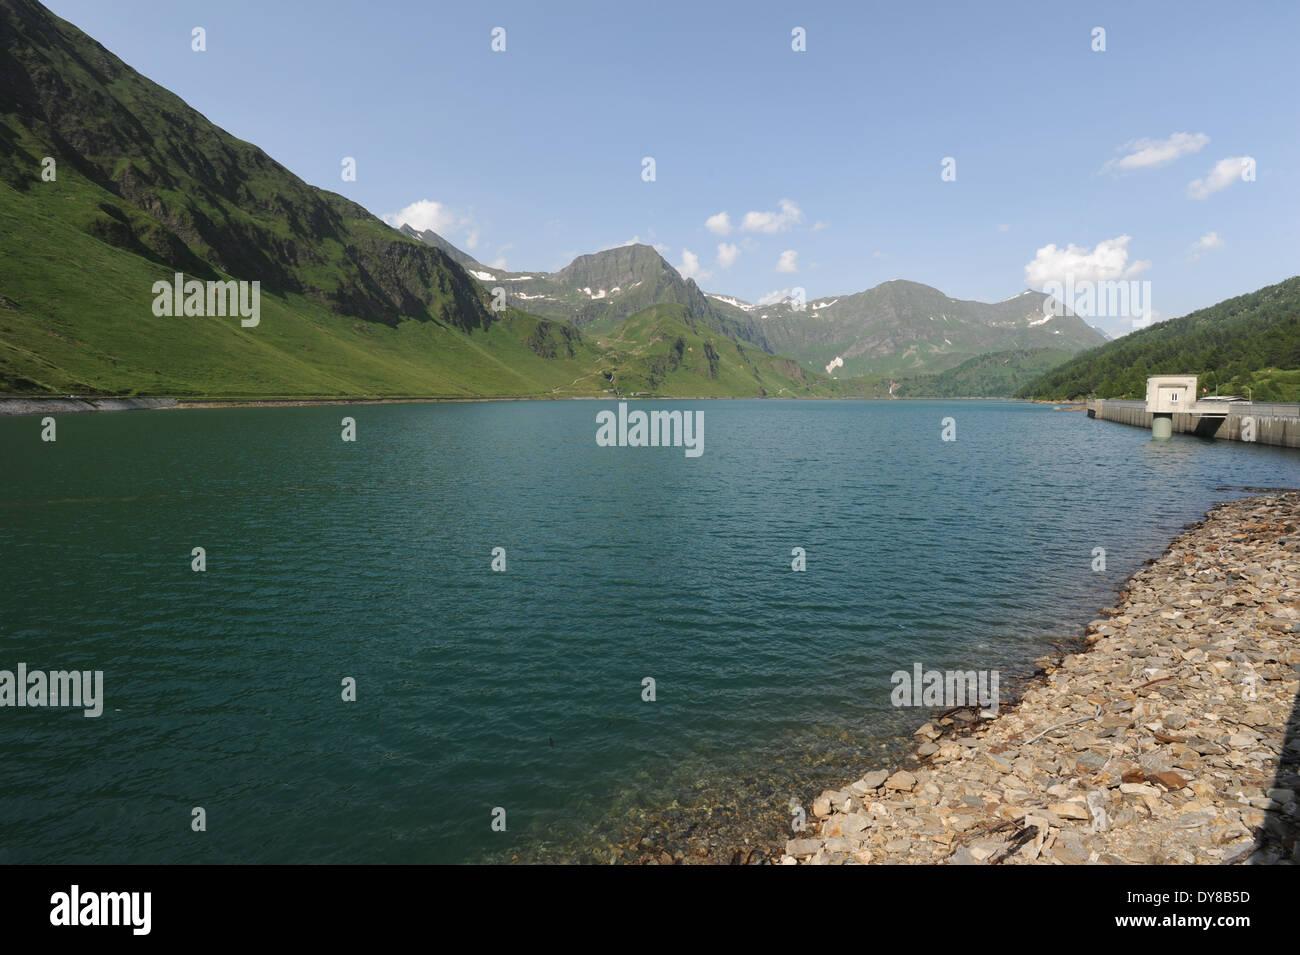 Switzerland, Ticino, Ritom, Piora, Quinto, lake, mountains Stock Photo